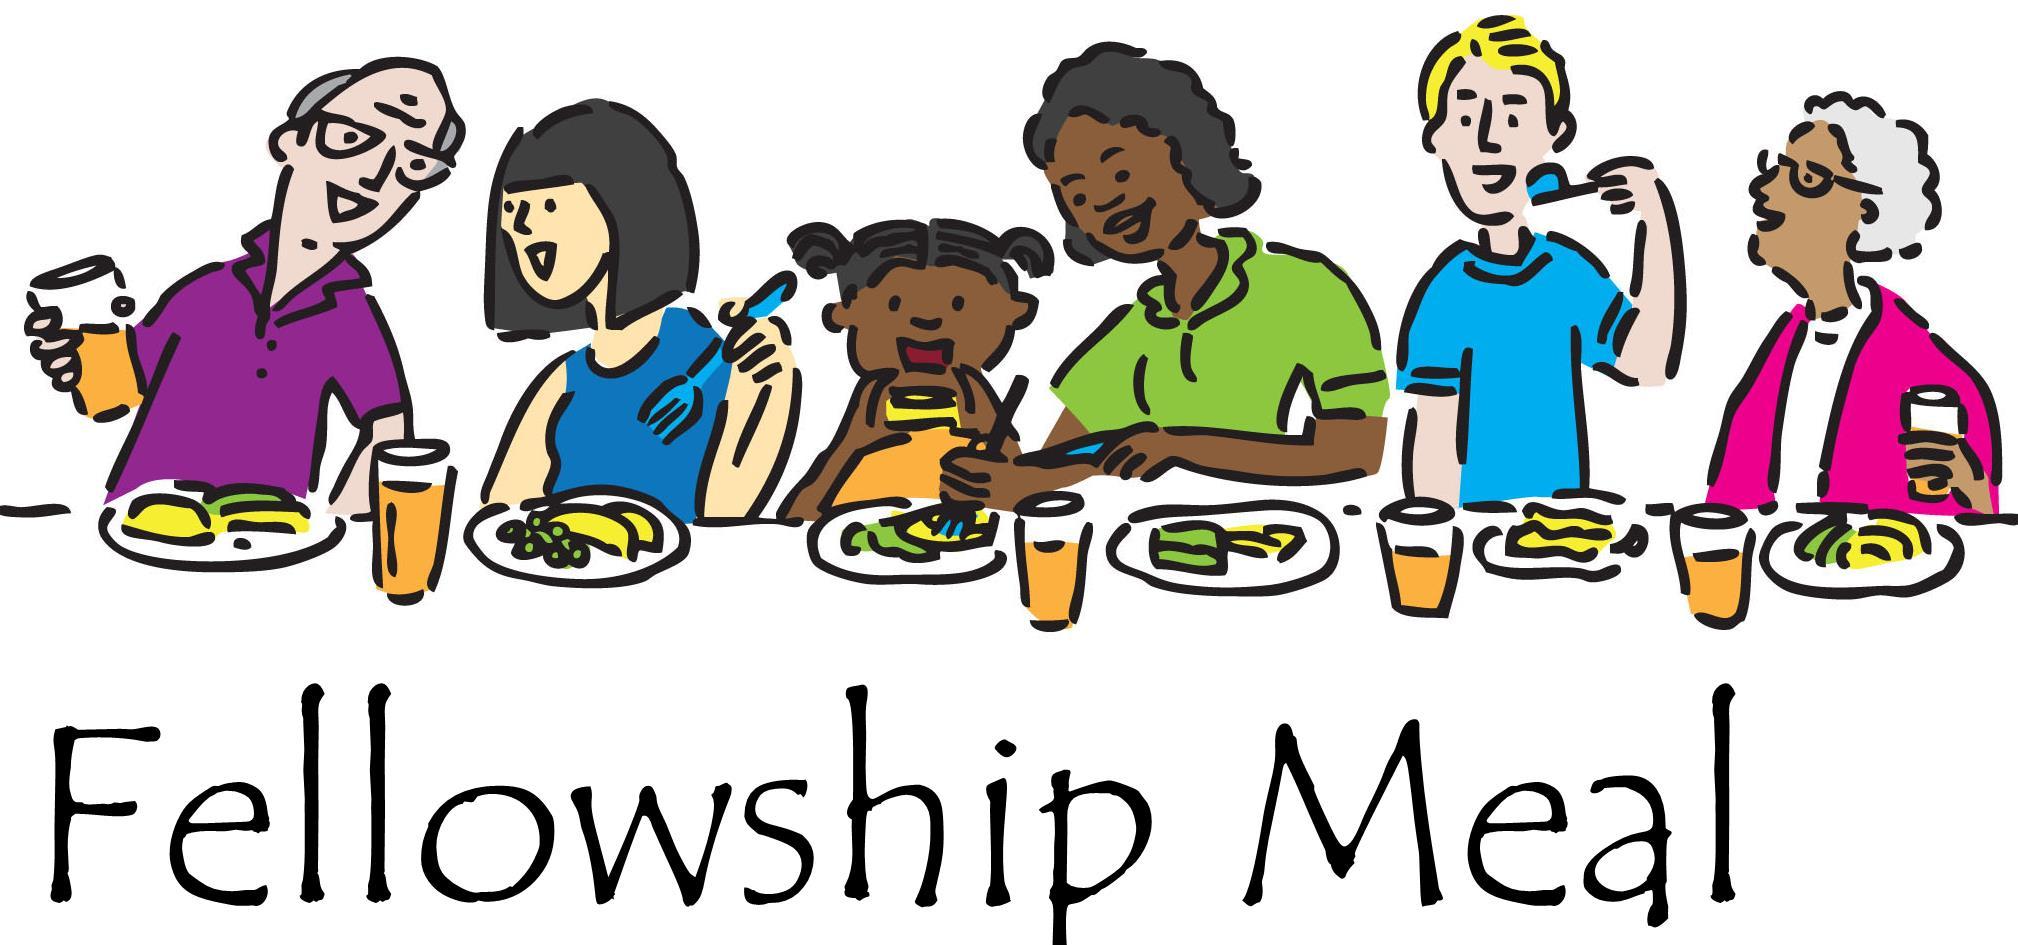 Group Dinner Clip Art Men's fellowship clipart - clipart kid